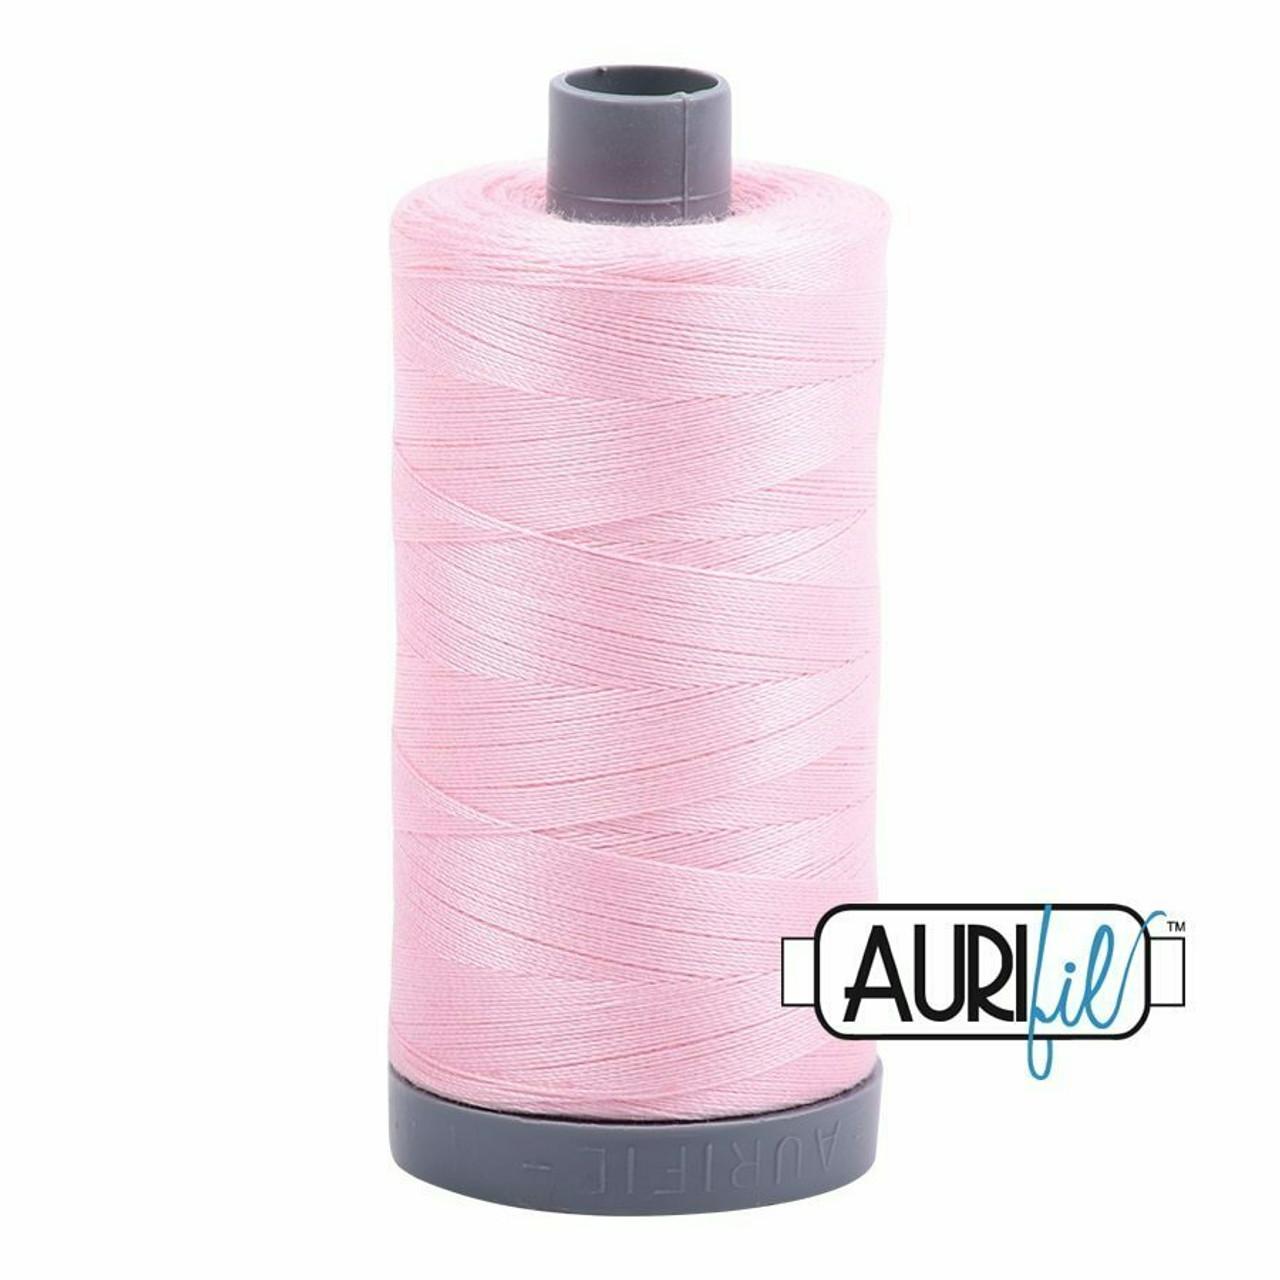 Aurifil 28wt Baby Pink (2423) thread